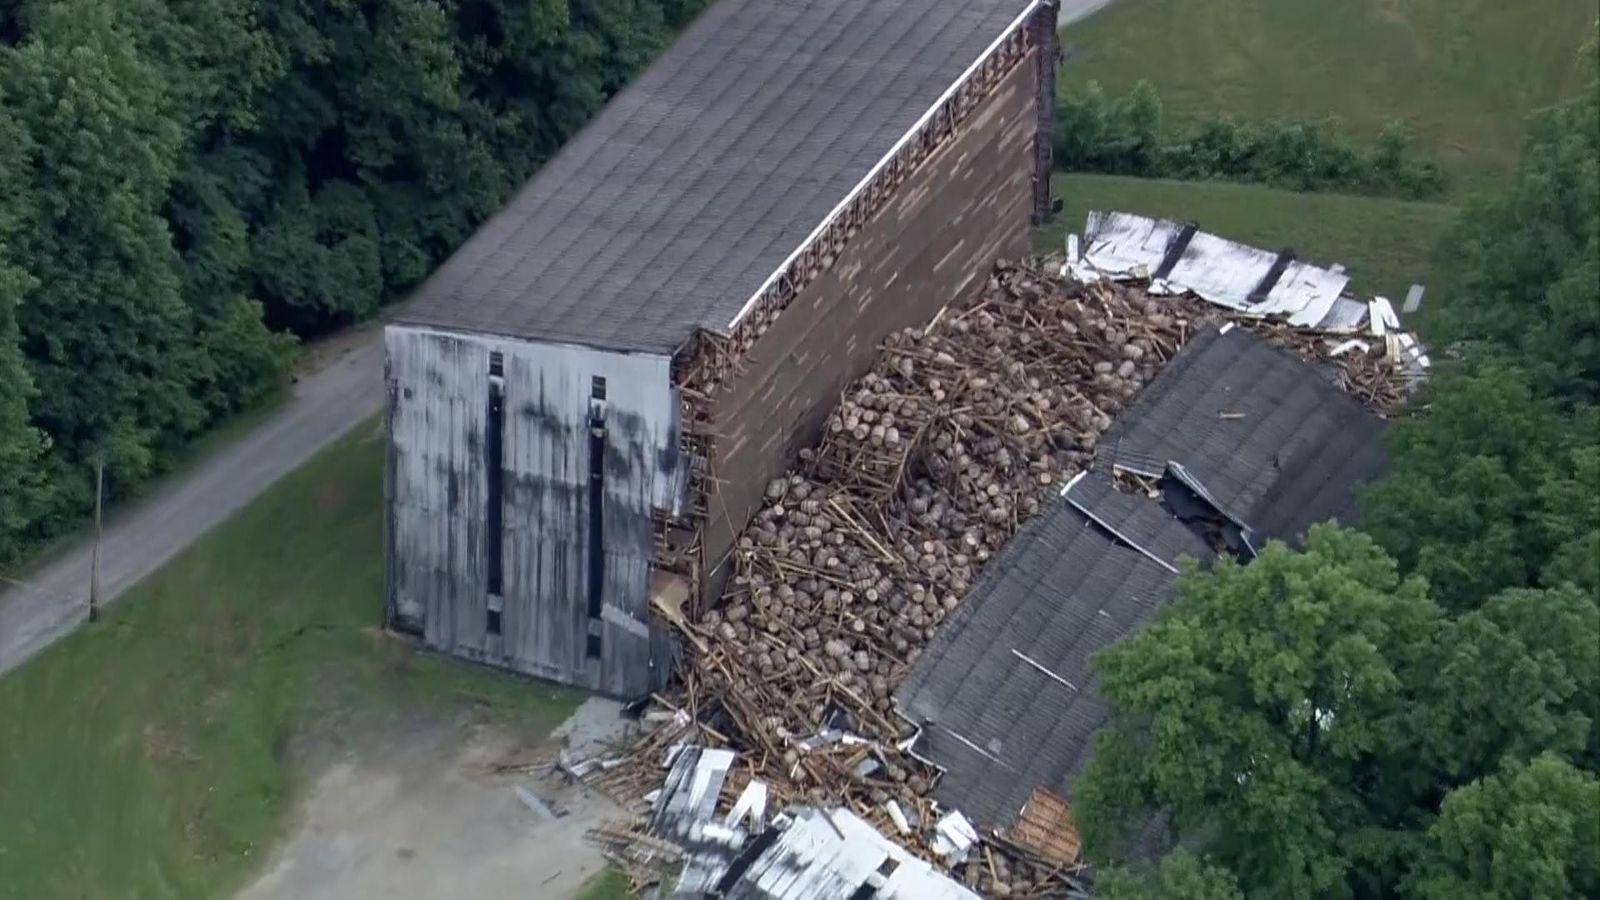 9 000 Whiskey Barrels Crash To Ground In Warehouse